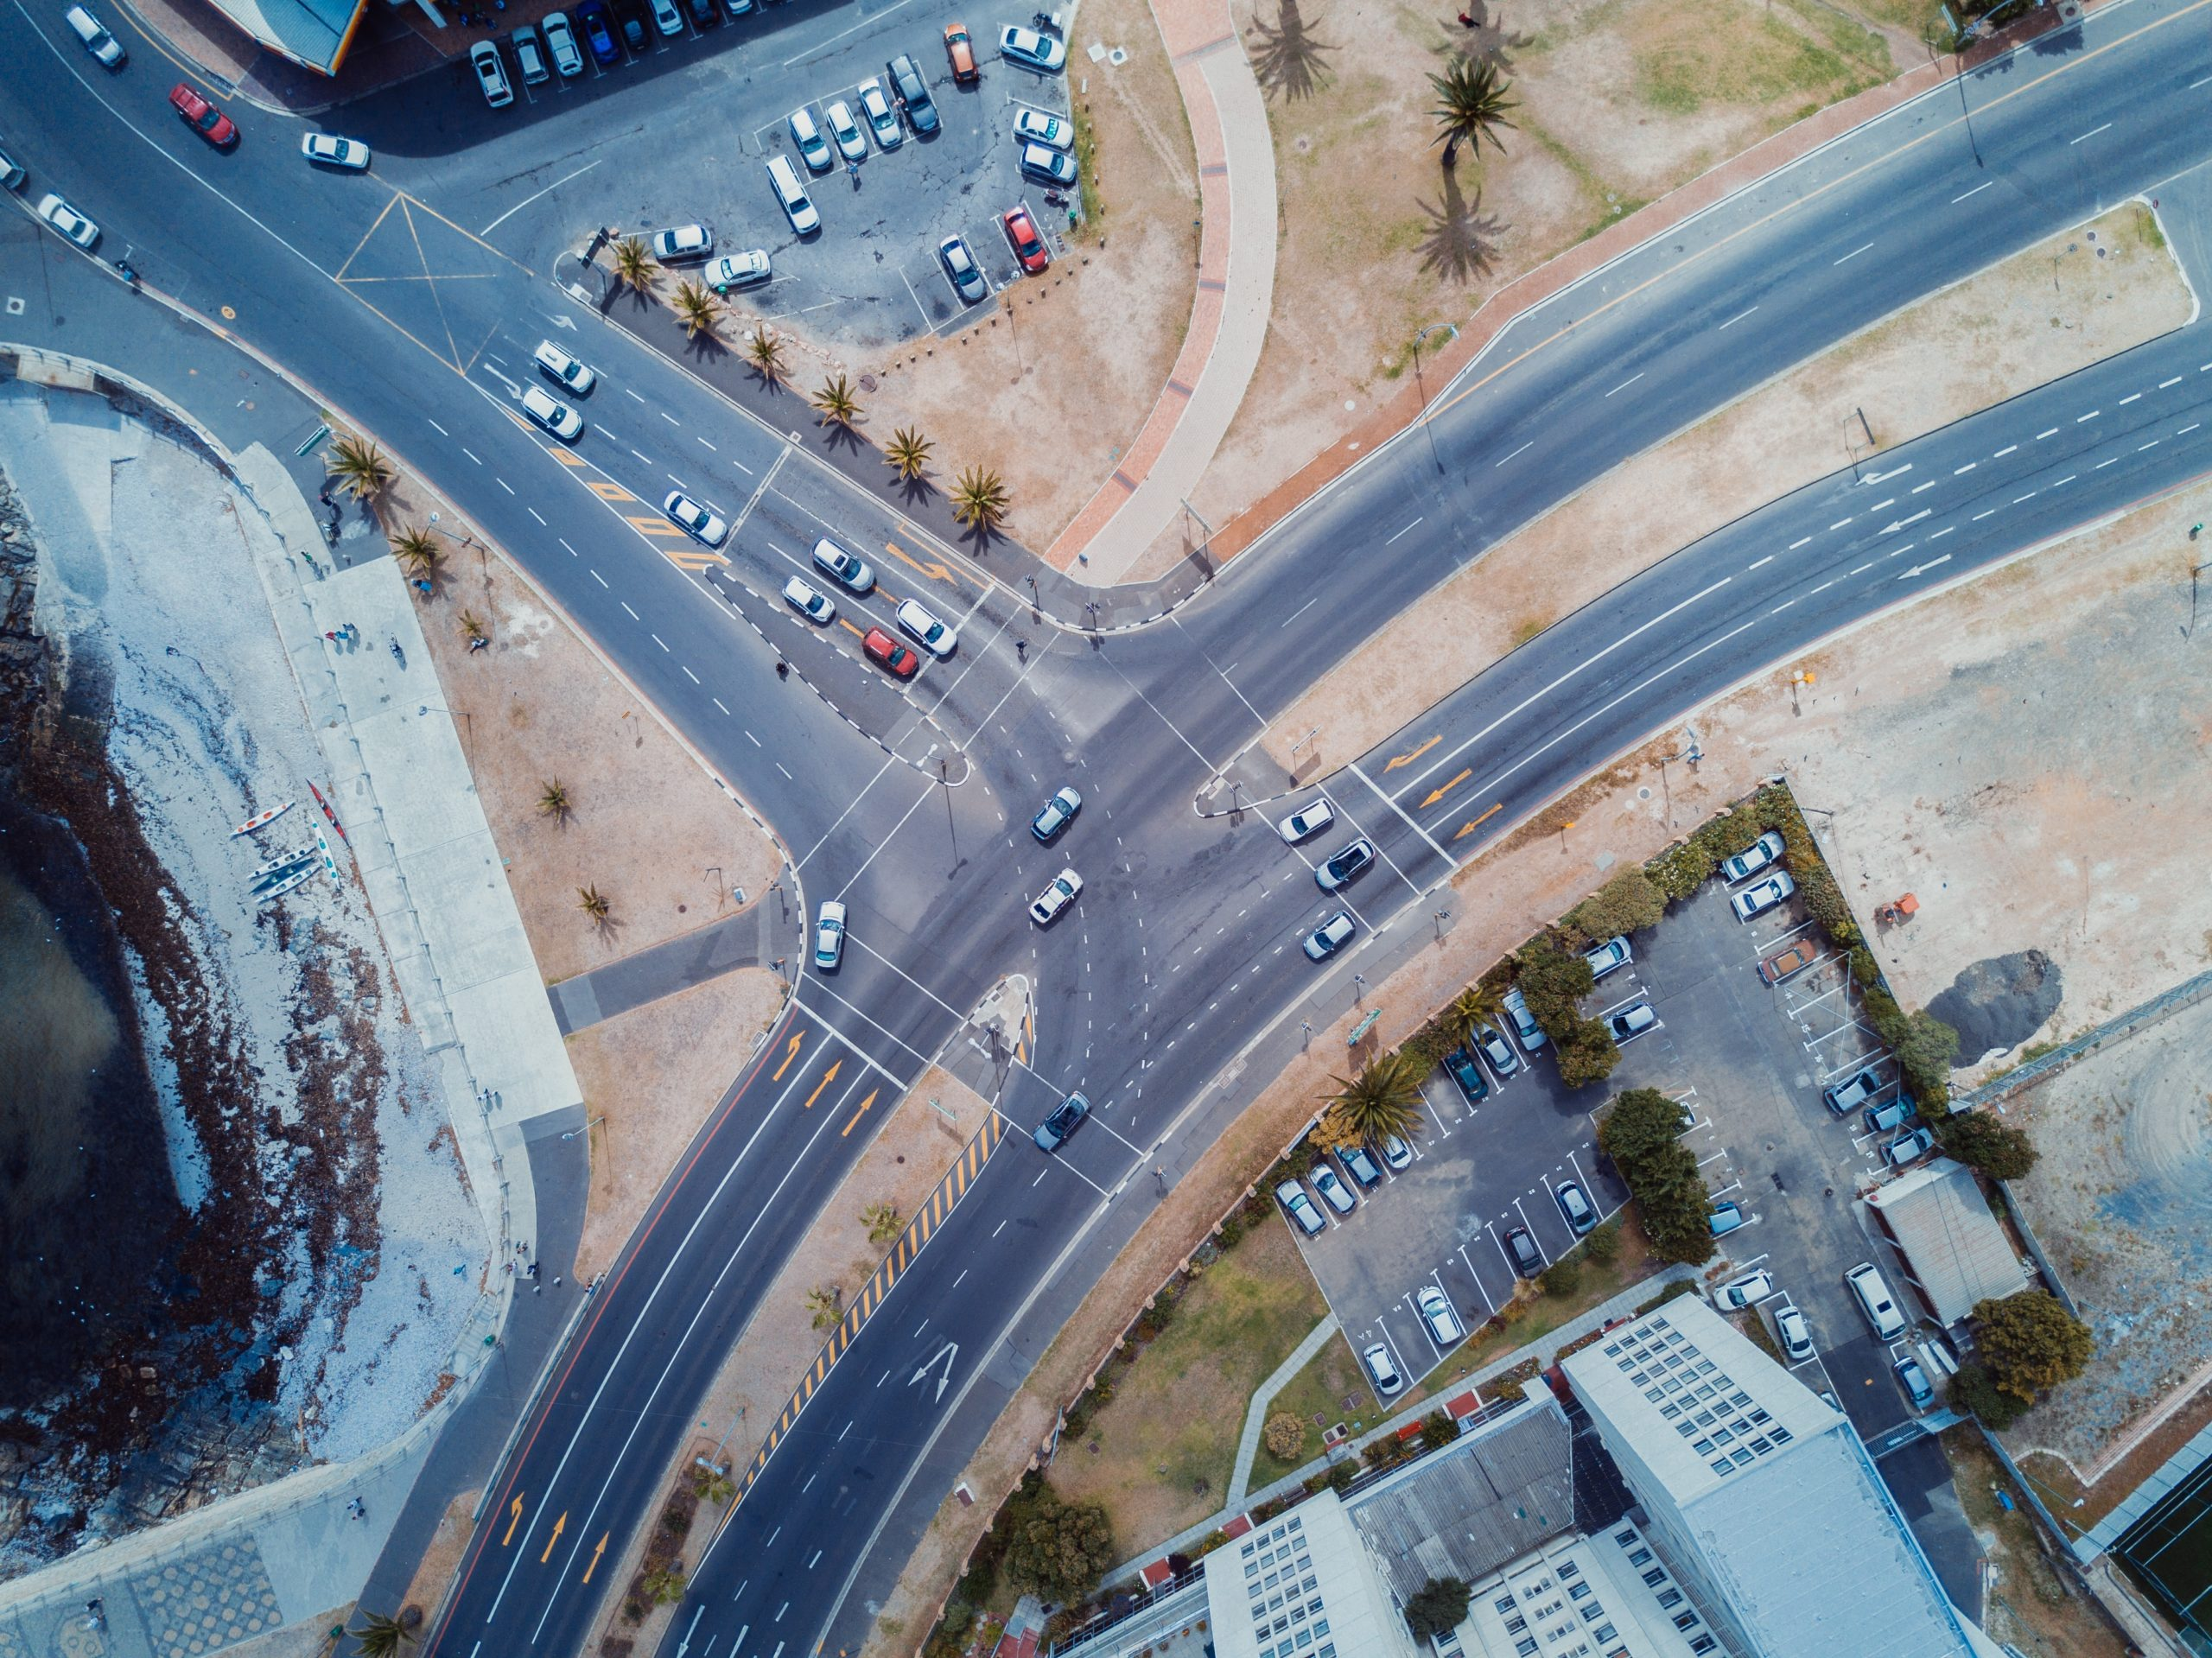 Leeto la Polokwane to test Traffic signals along Nelson Mandela Drive